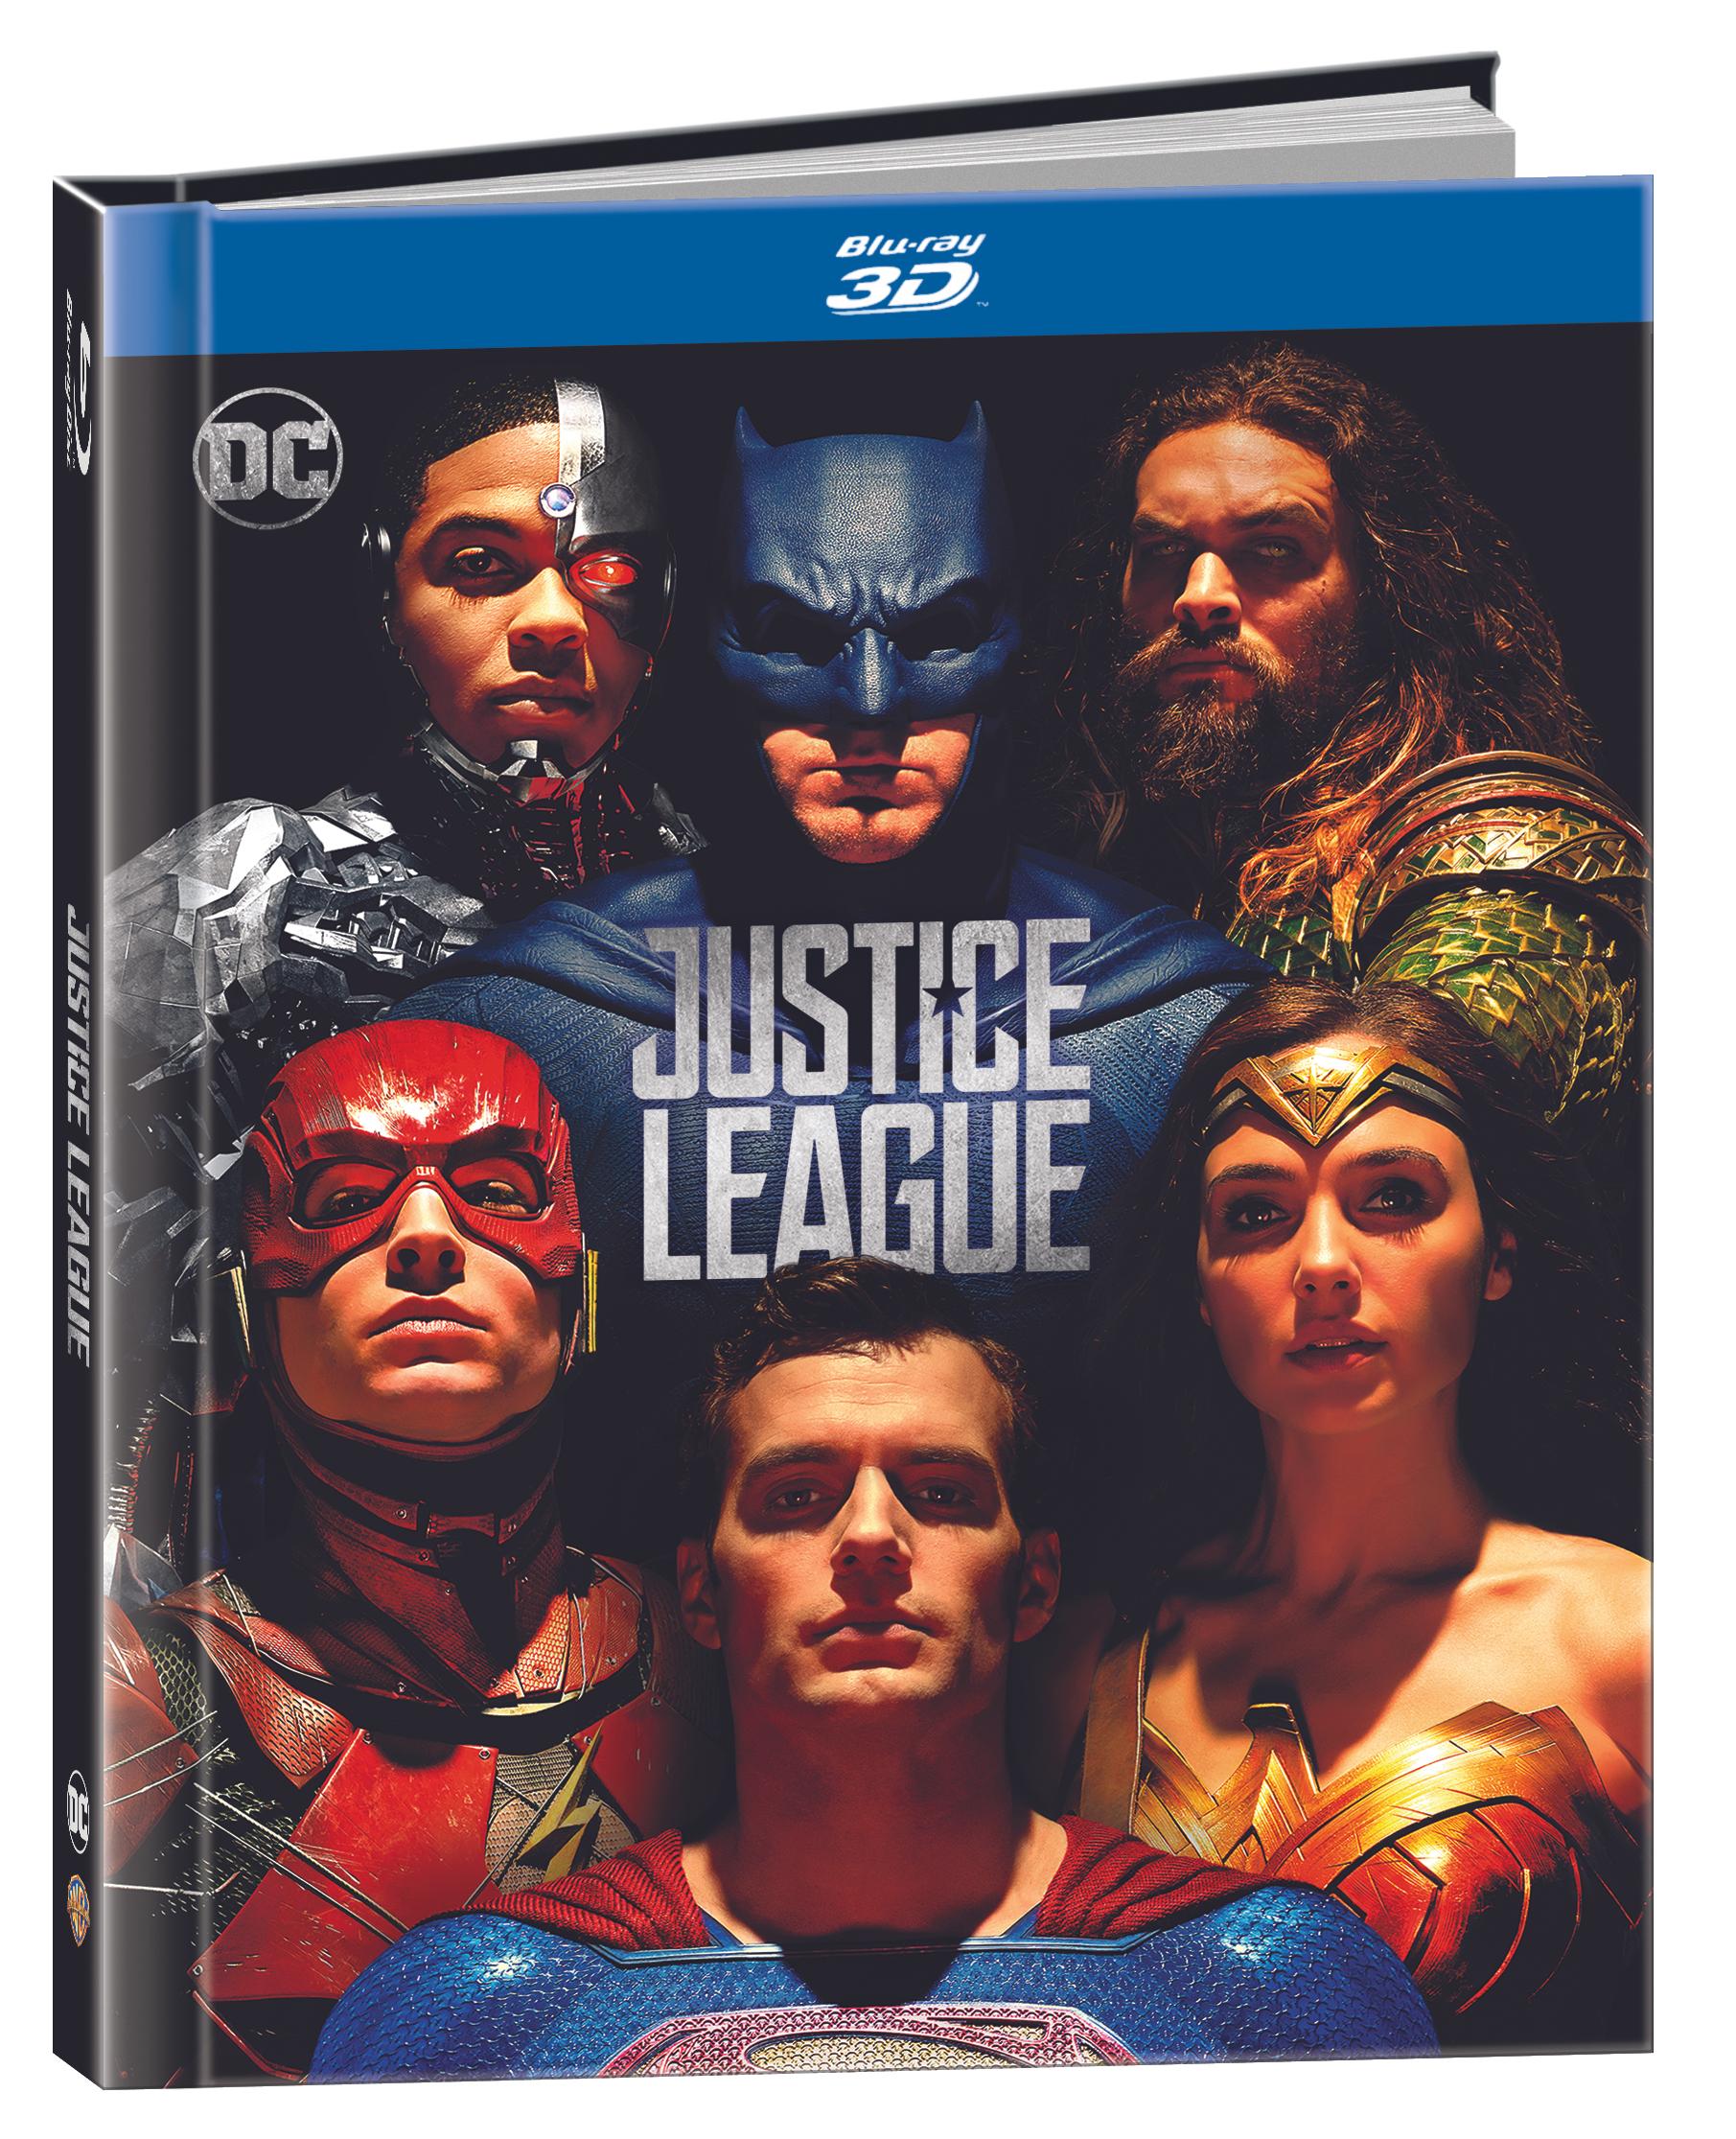 3D Blu-rayDigibook